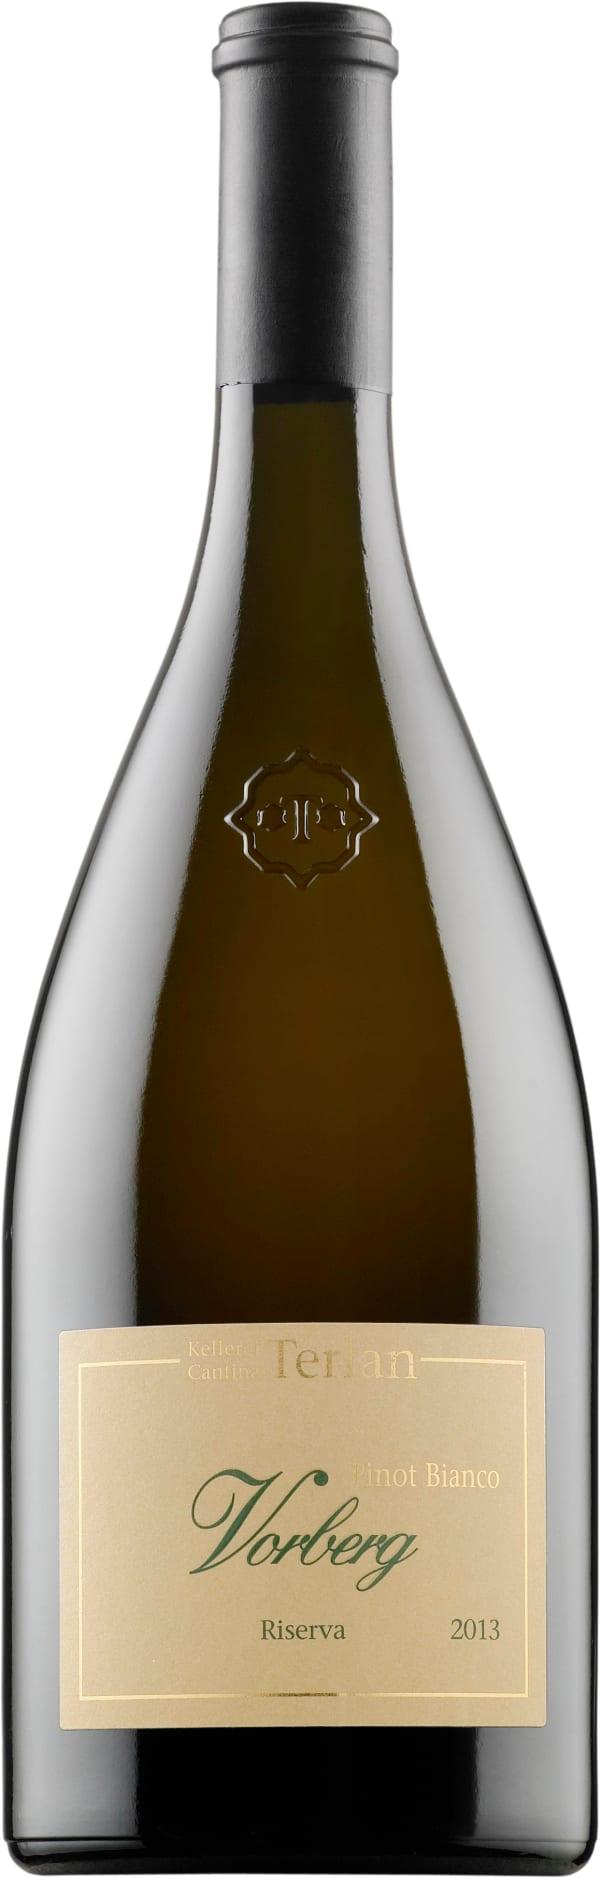 Terlan Vorberg Pinot Bianco Riserva 2013